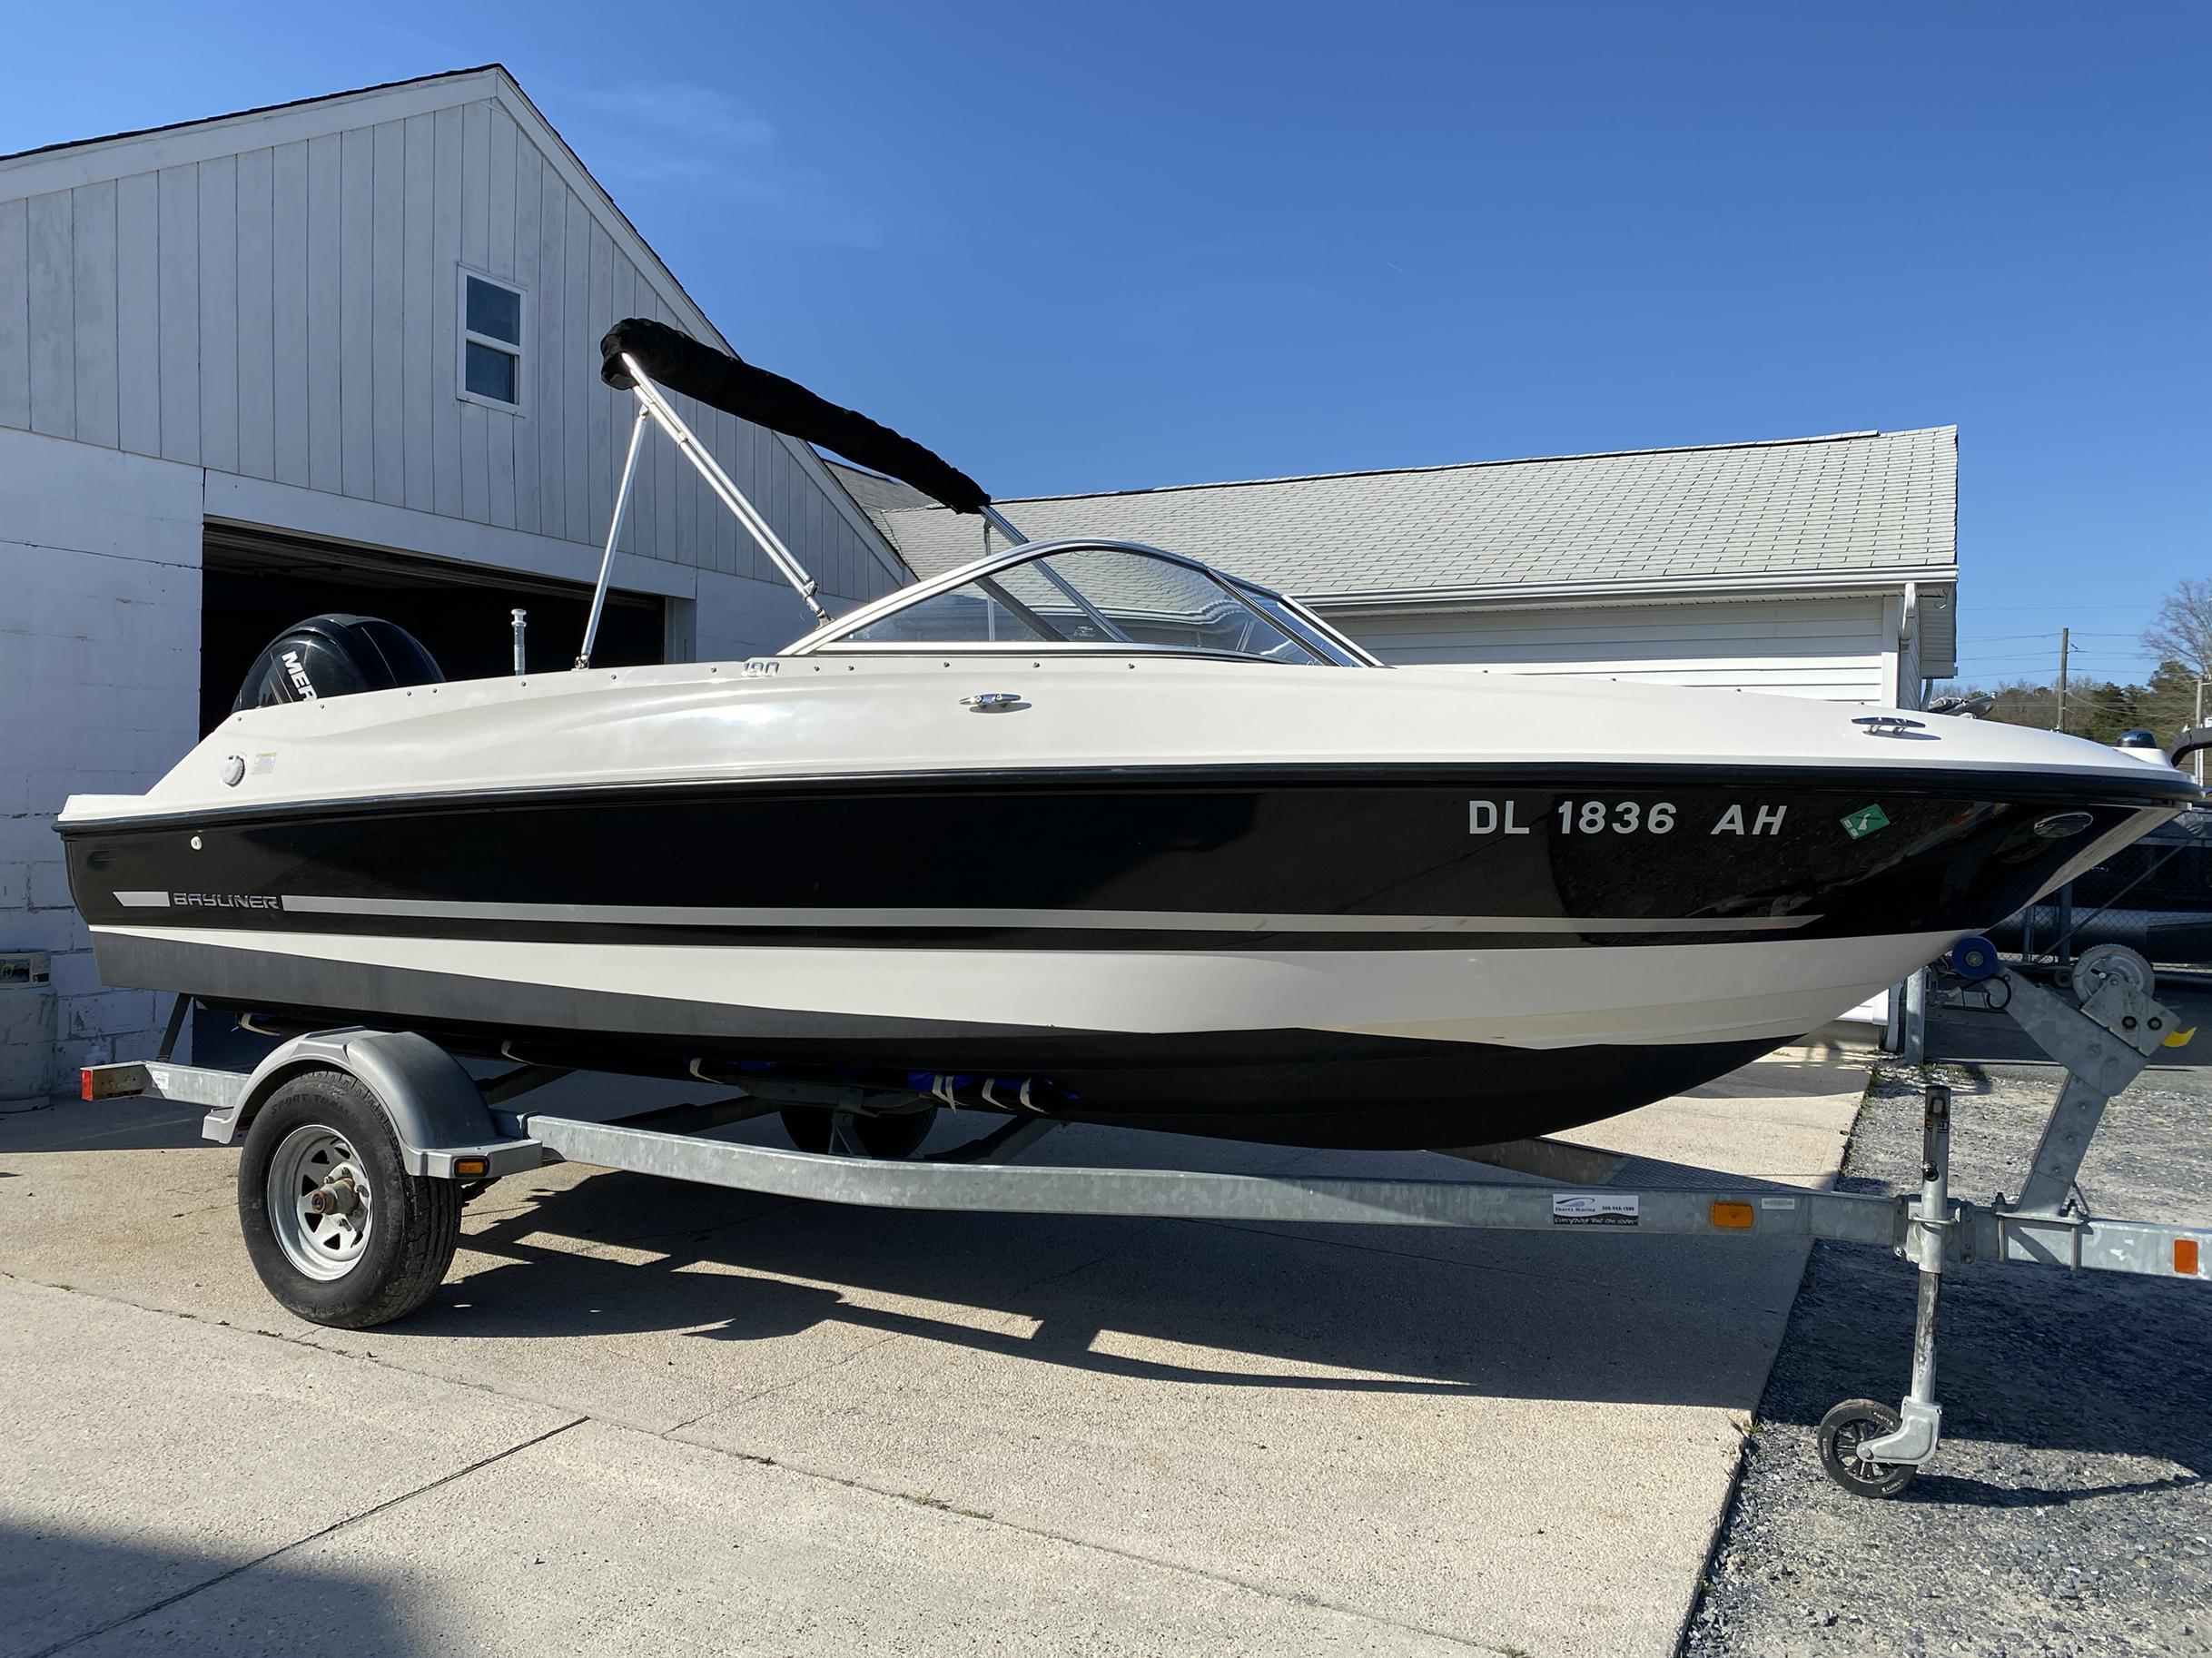 2014 Bayliner boat for sale, model of the boat is 190 Bowrider & Image # 1 of 10